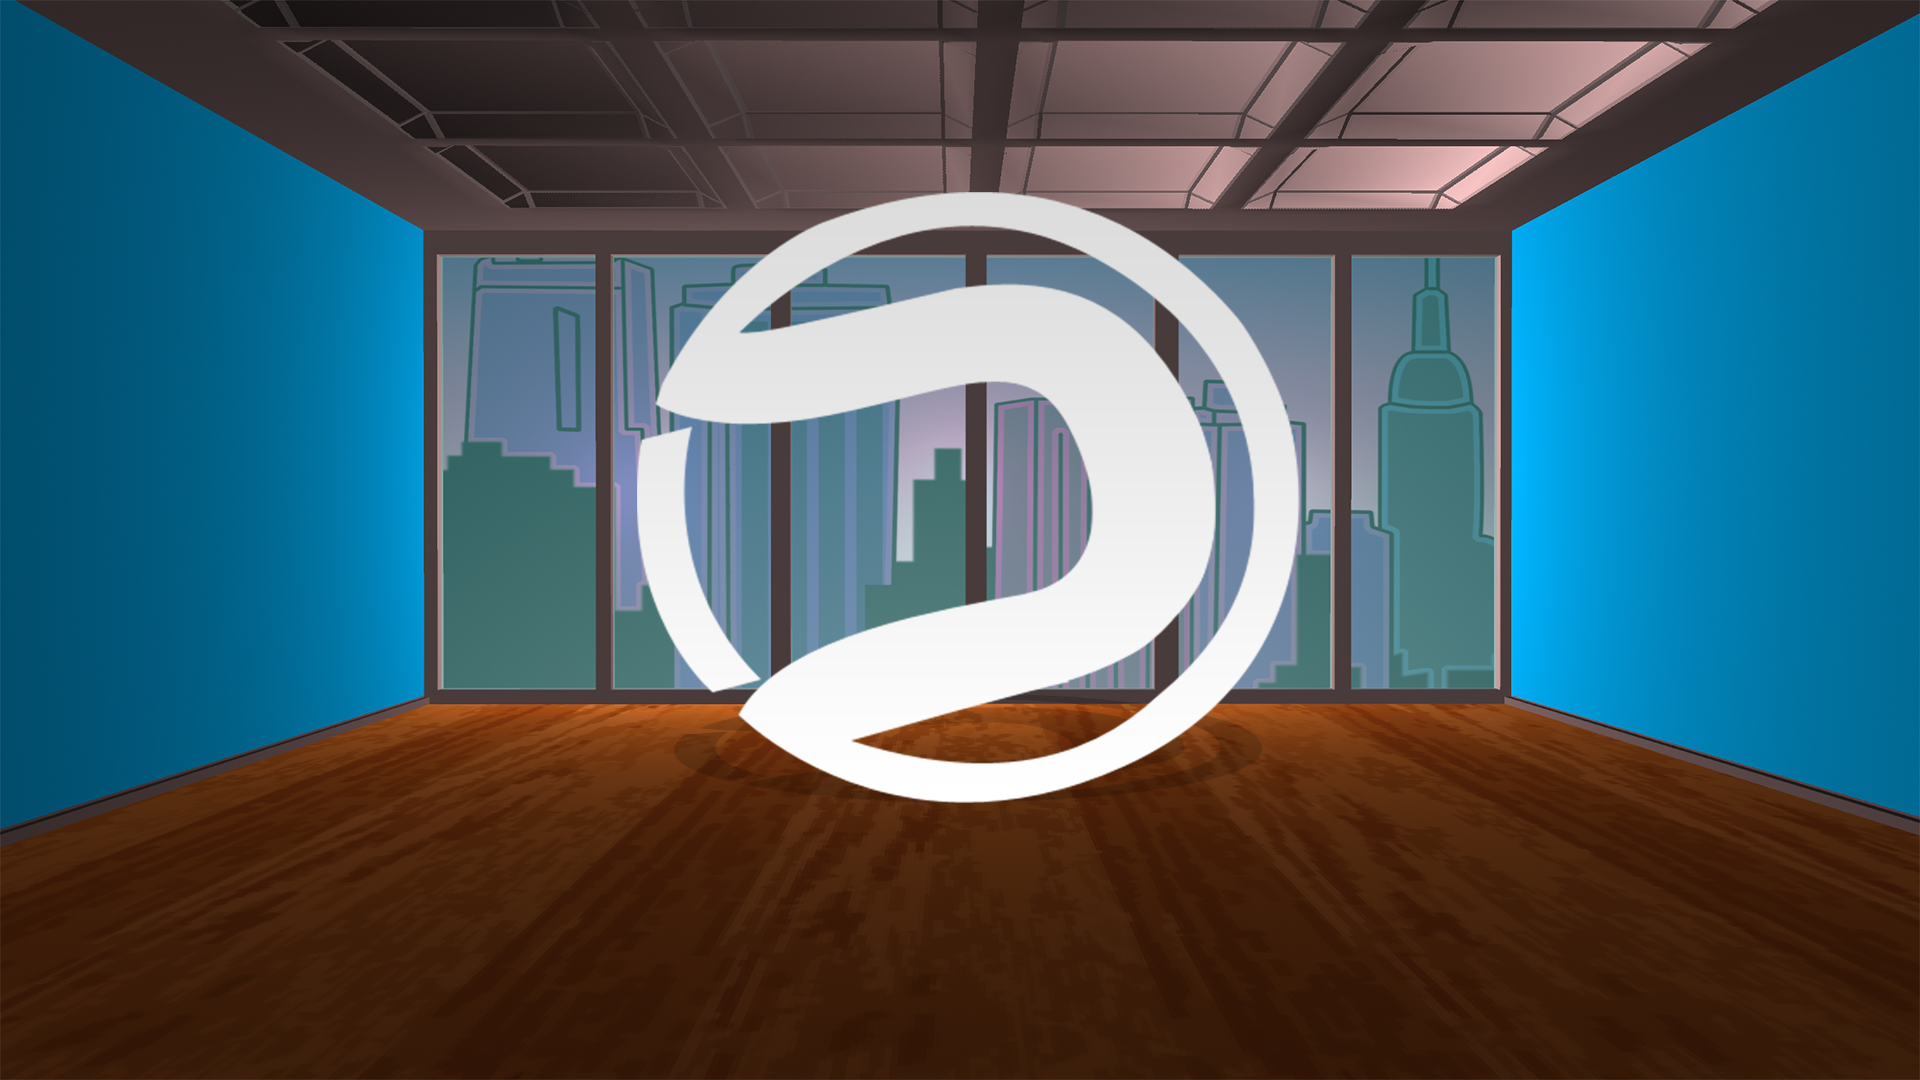 Darerising Logo Dare-bg-by-nyx pngDarerising Logo